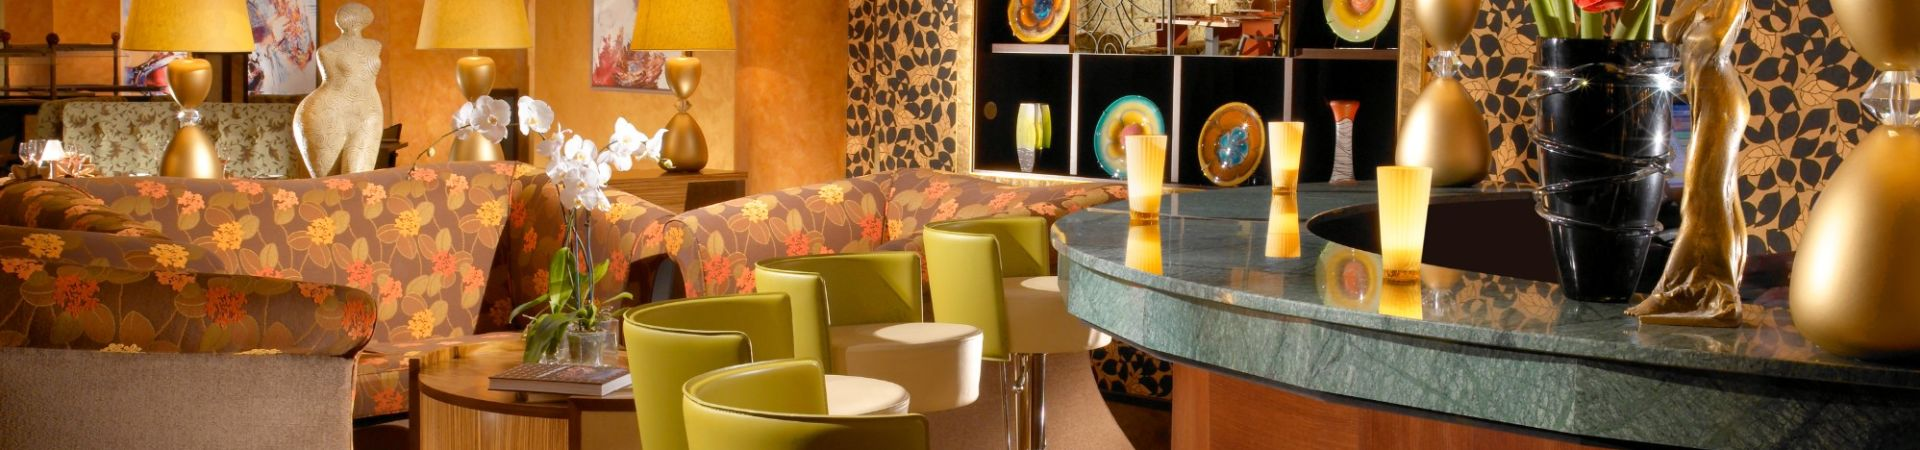 Hotel Savannah Znojmo